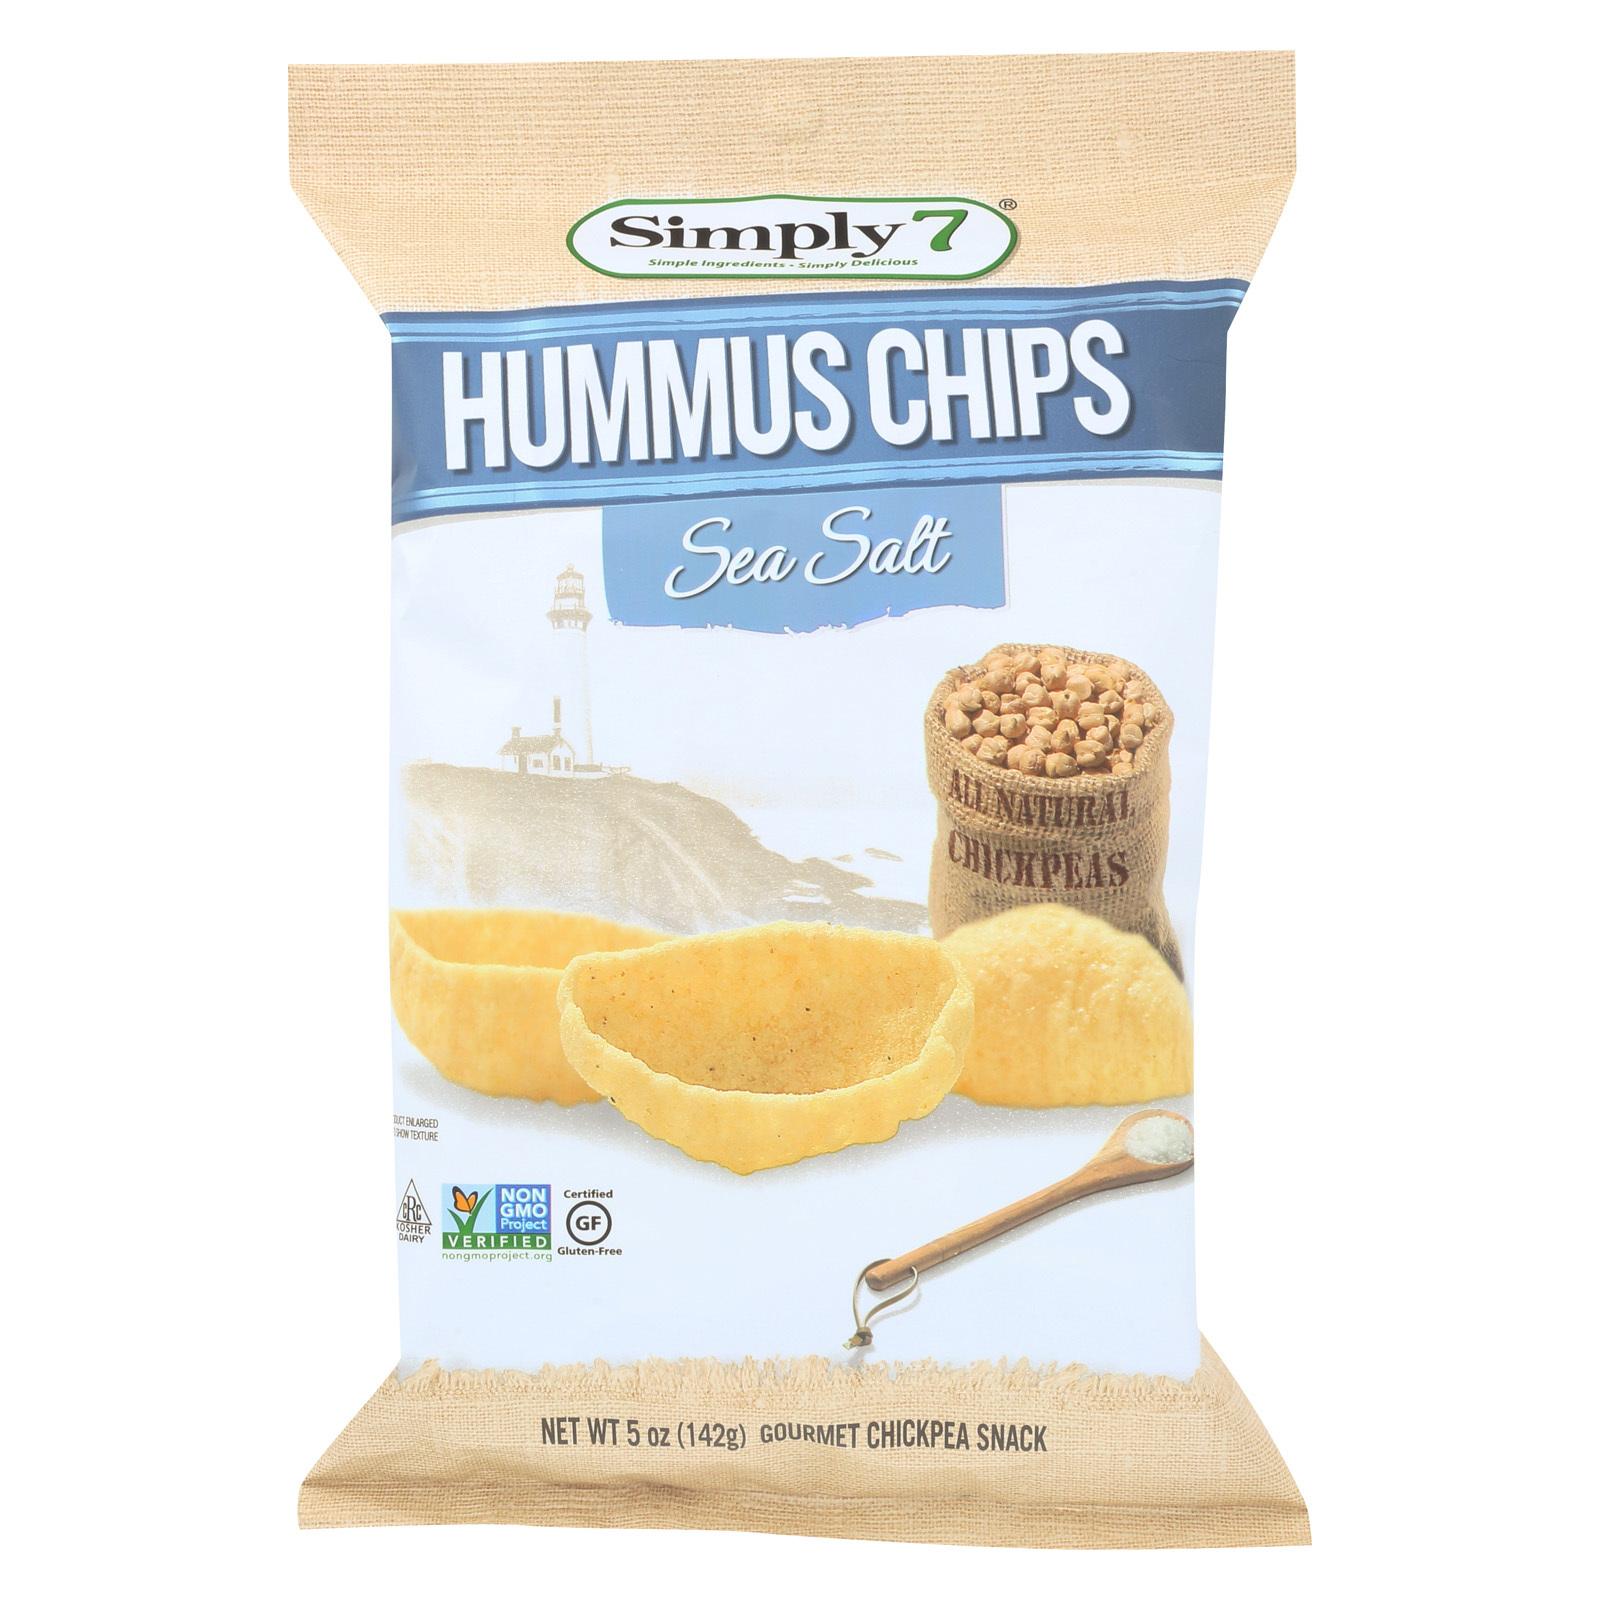 Simply 7 Hummus Chips - Sea Salt - Case of 12 - 5 oz.